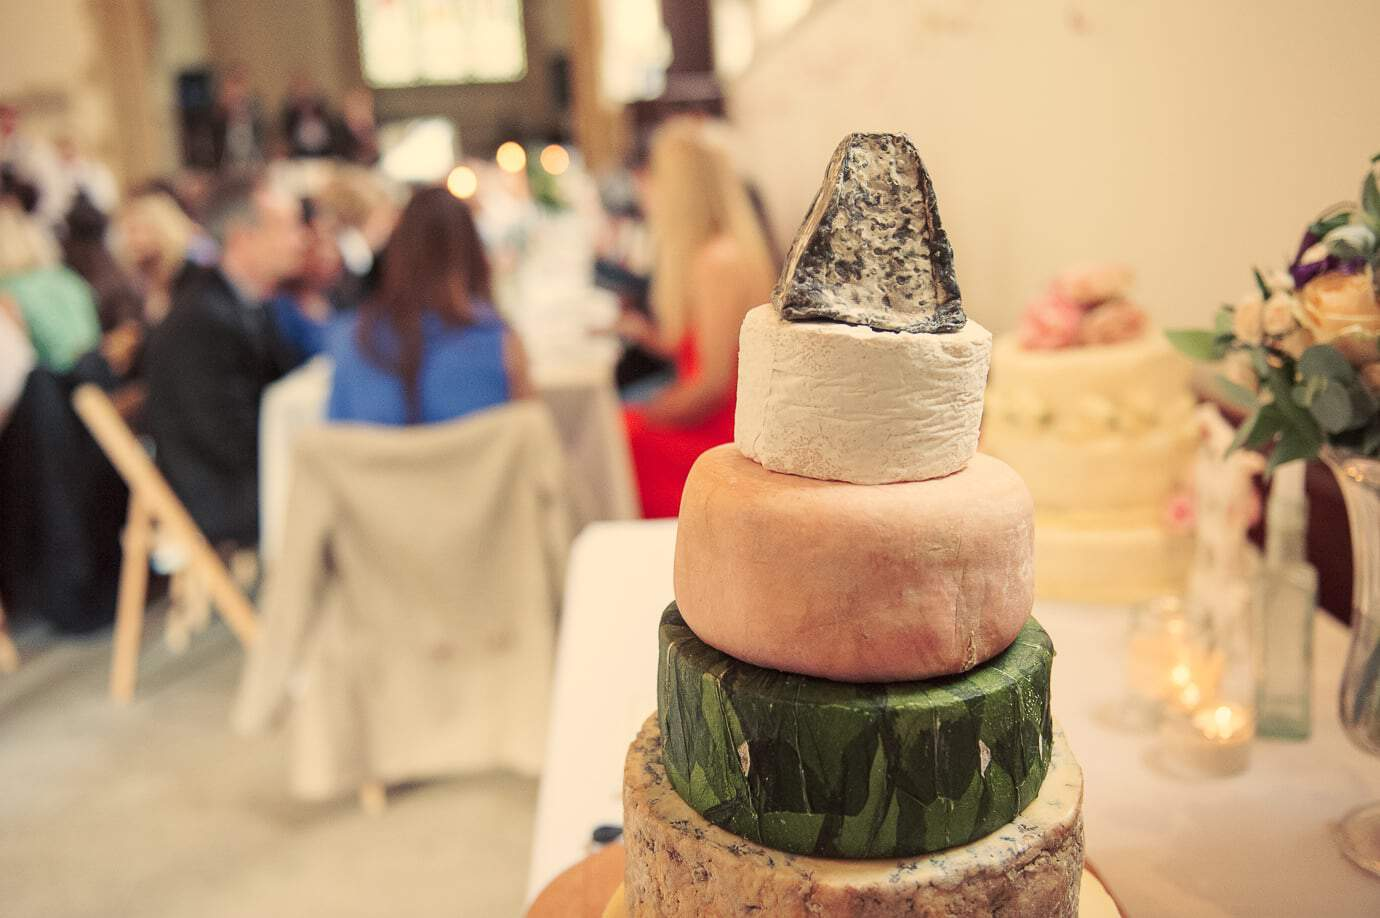 Cheese cake Wedding cheeses at Plush Manor wedding venue in Dorset